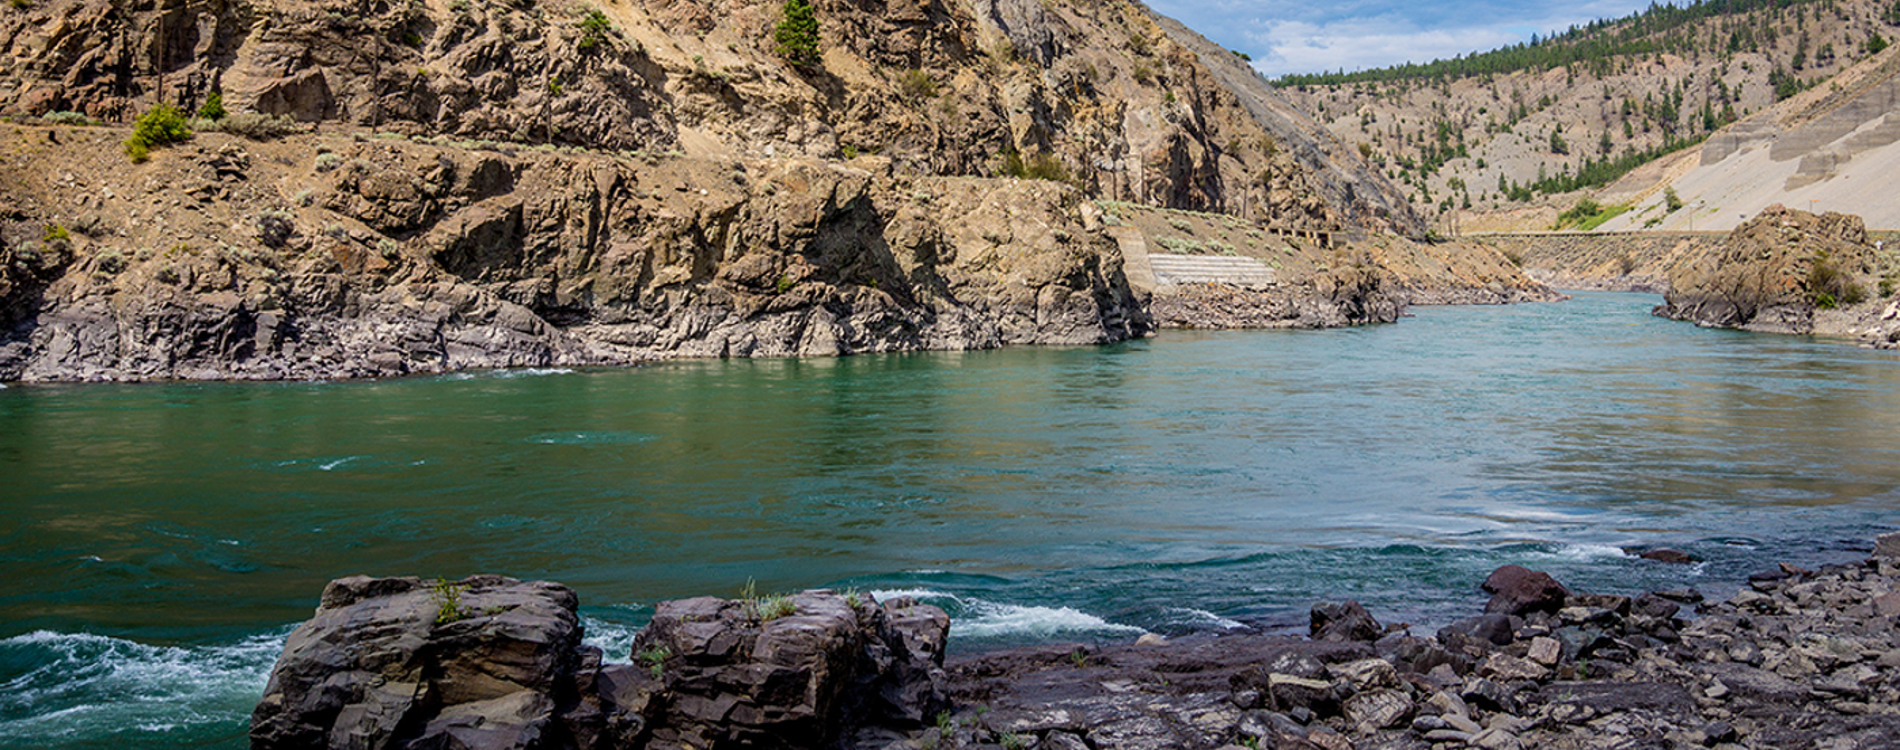 Fraser Canyon Fishing